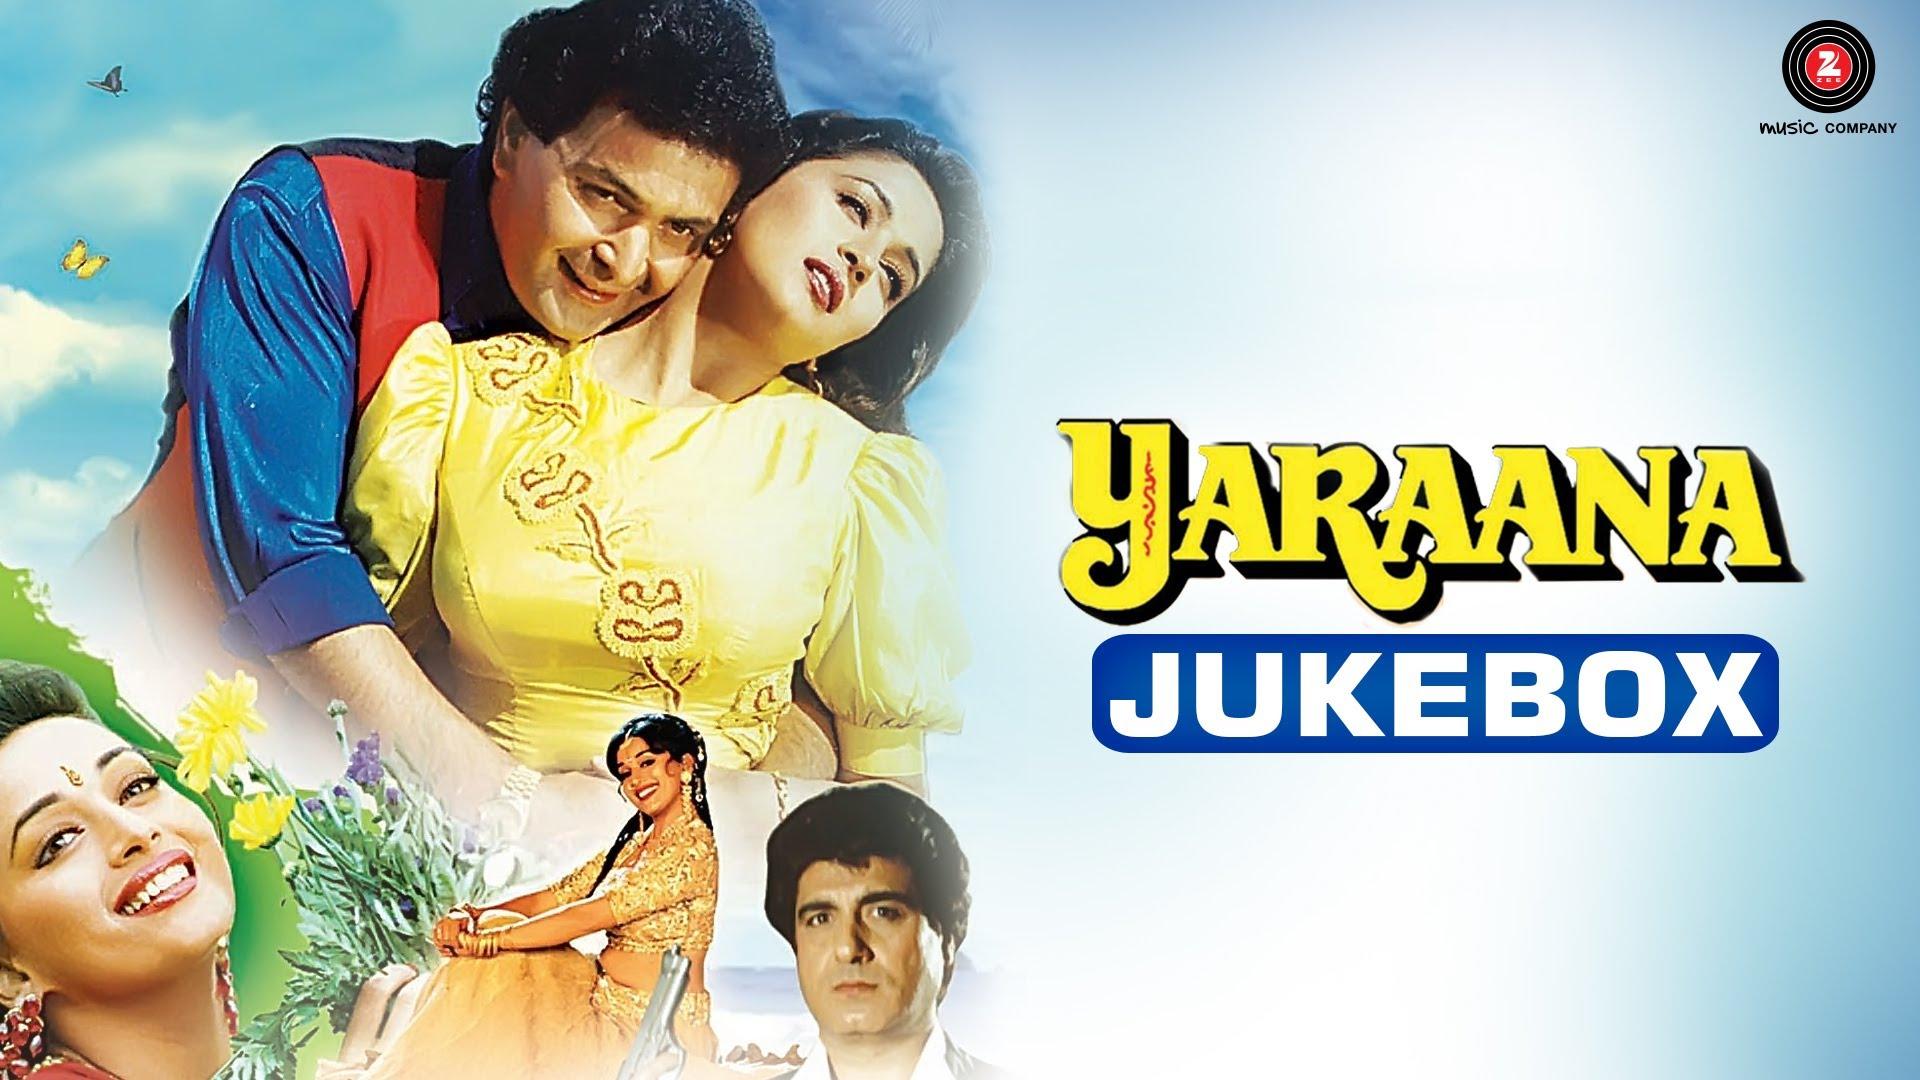 Yaraana 1995 mp3 songs free download slotcrise.